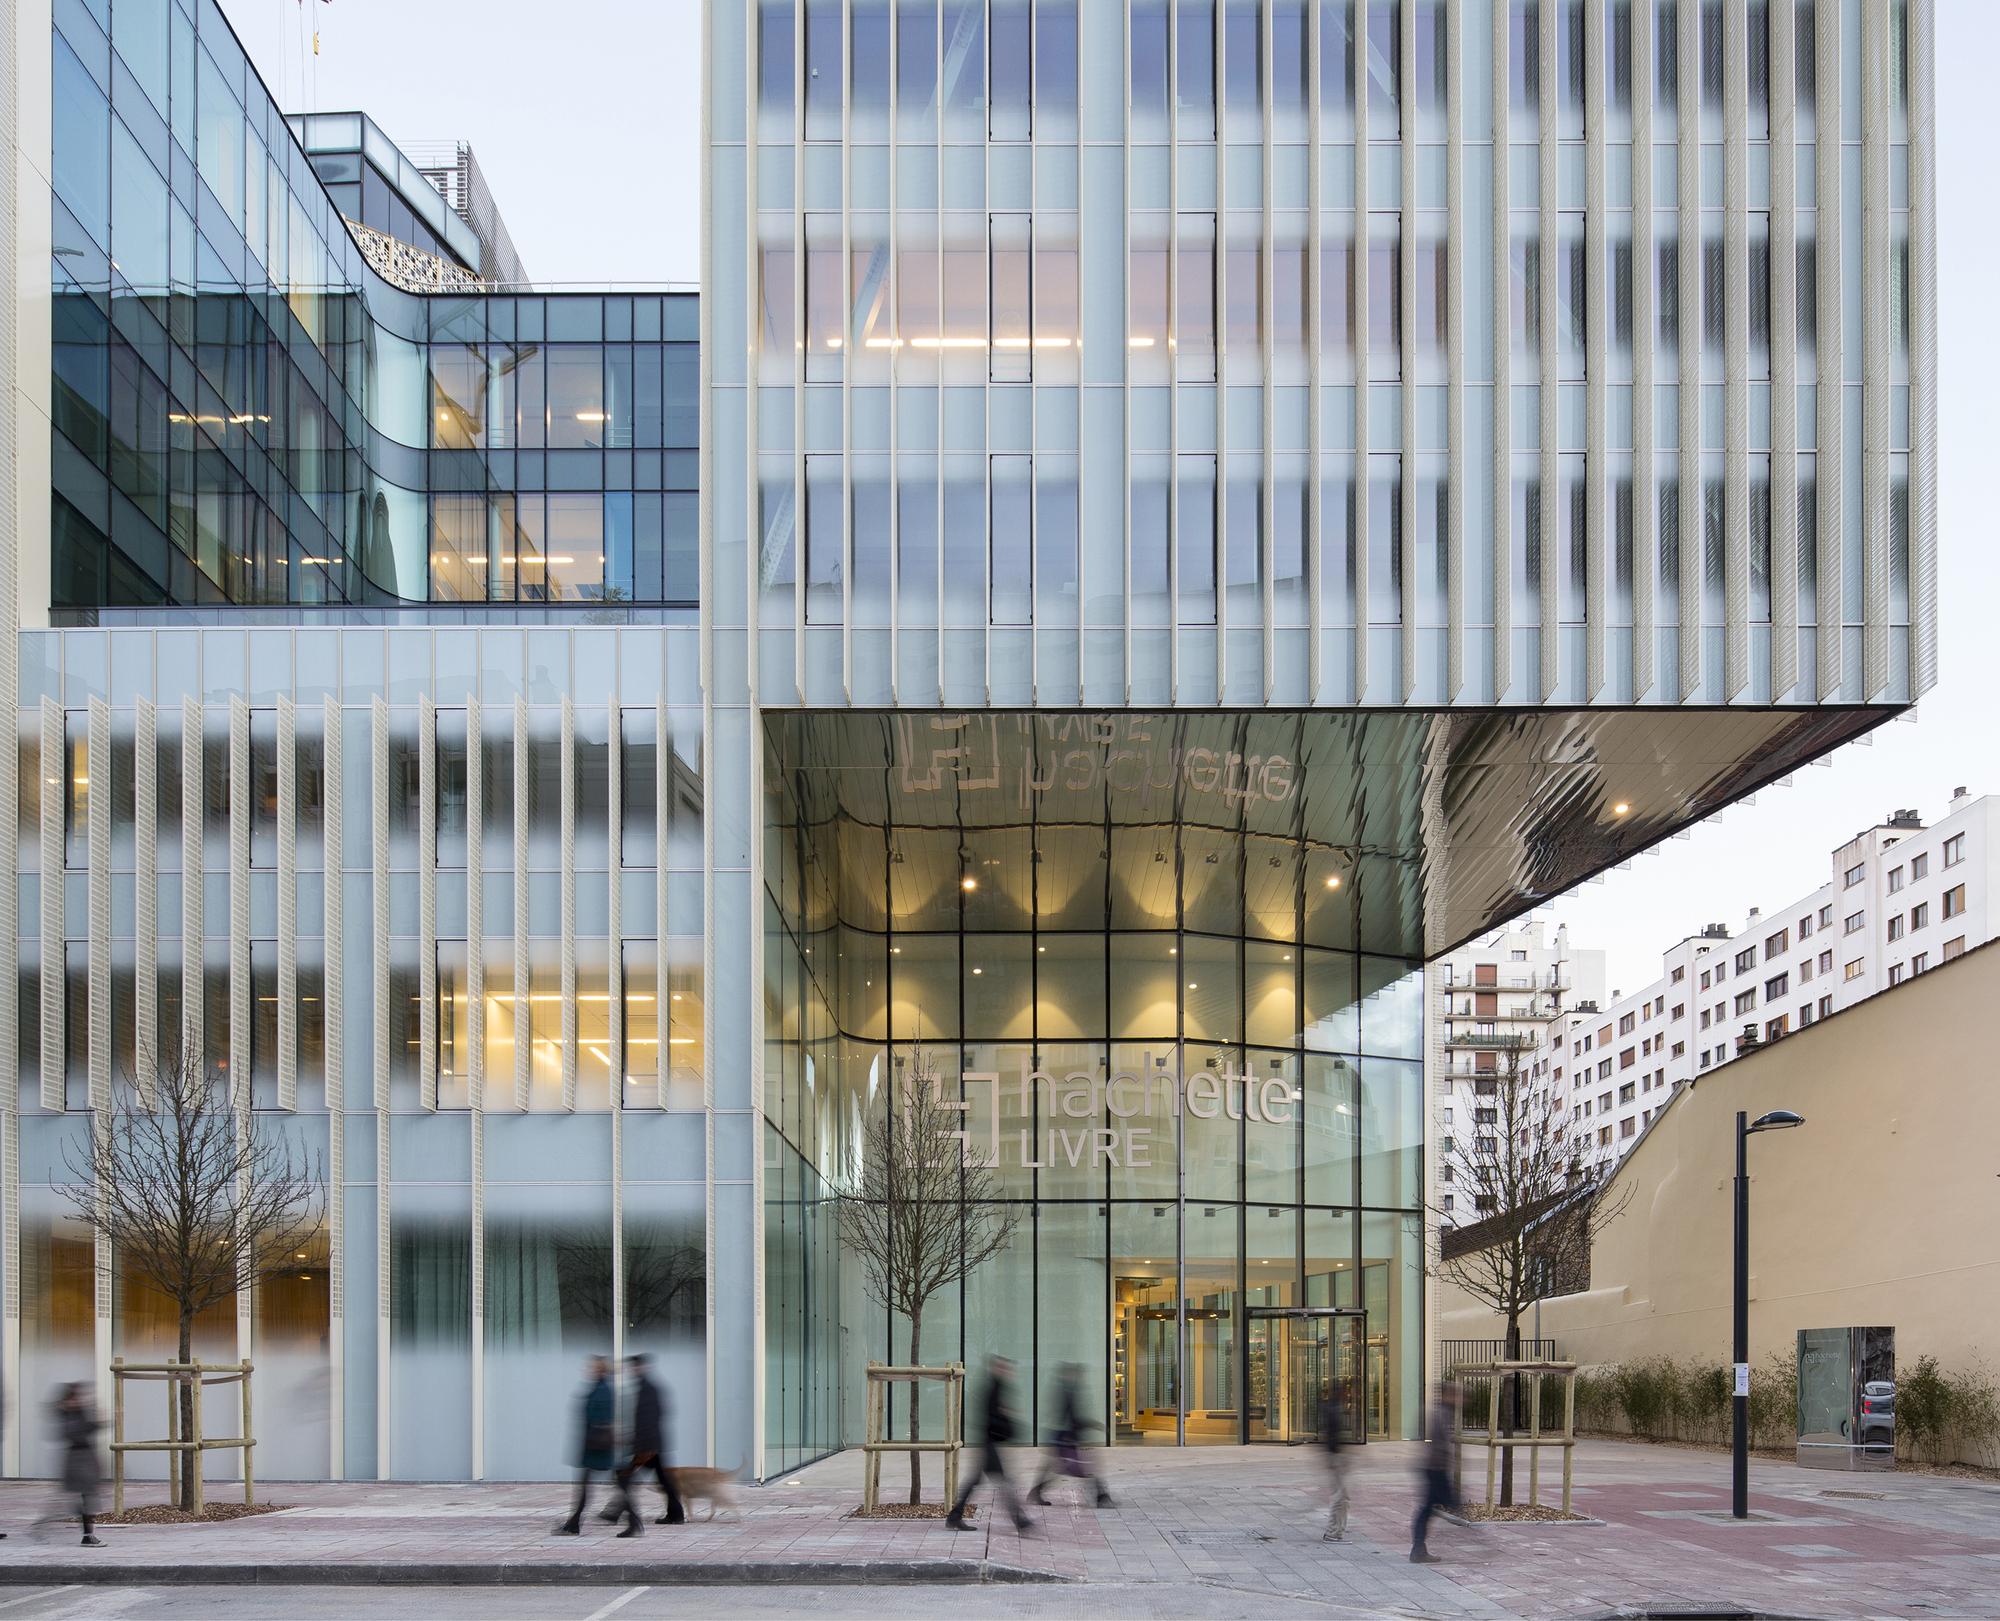 Sede biblioteca editorial Hachette / Jacques Ferrier Architectures